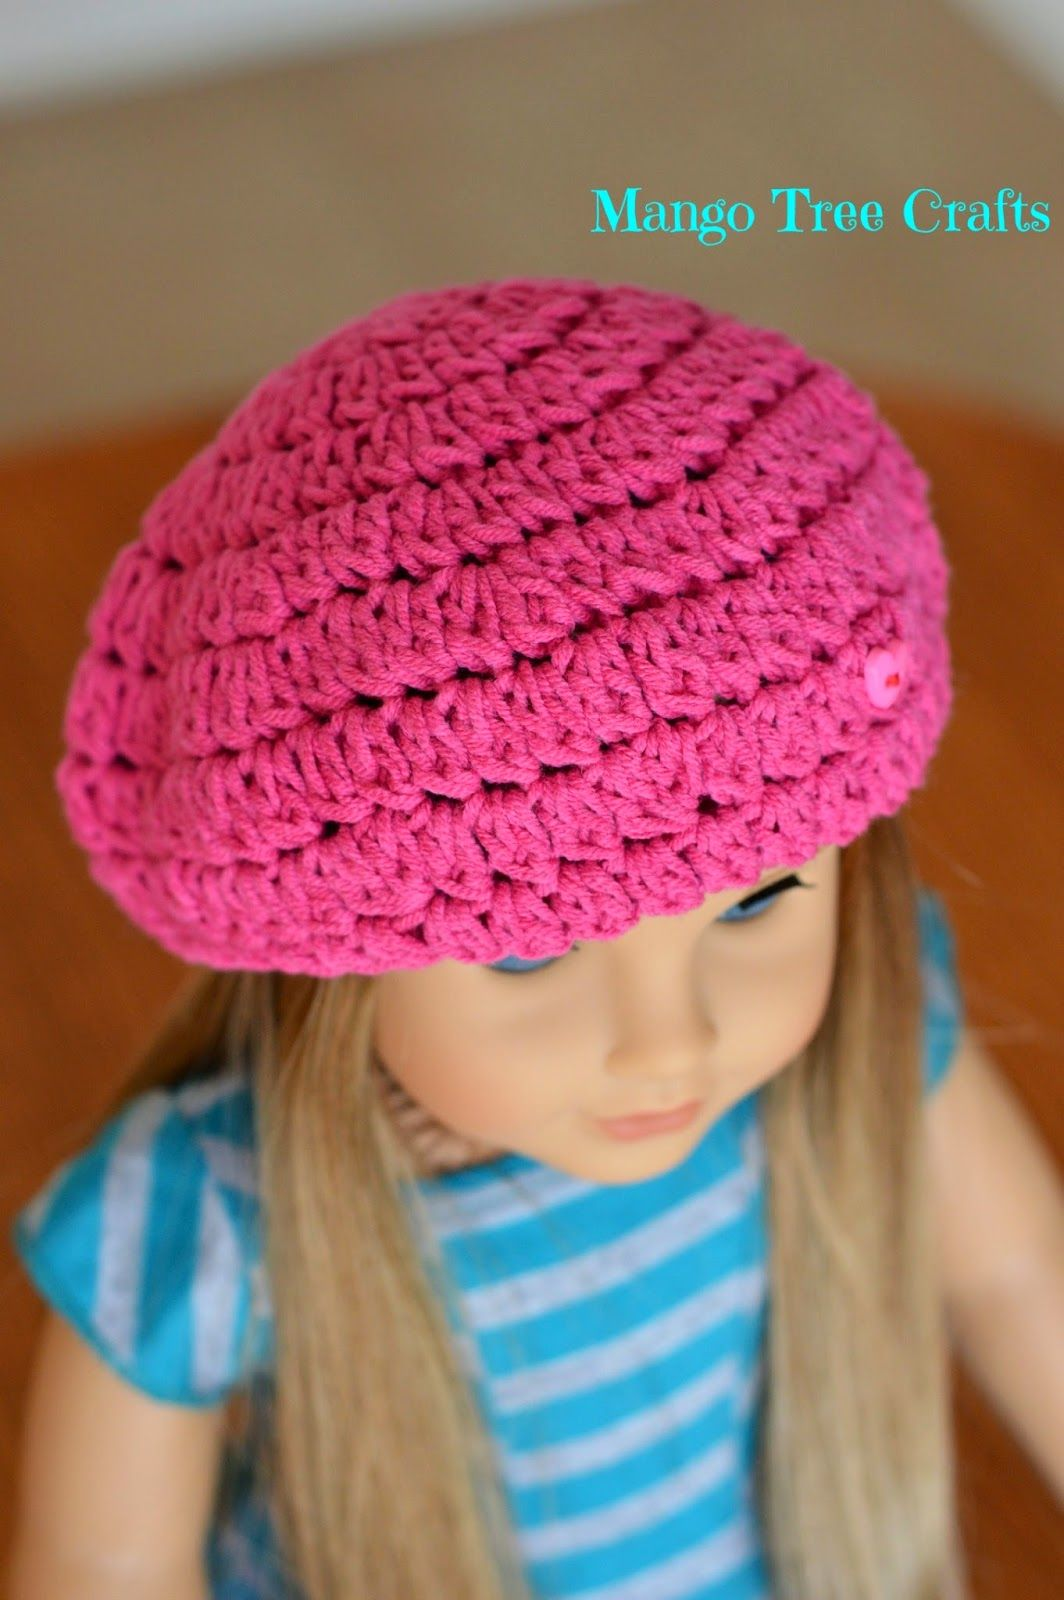 "Mango Tree Crafts: Crochet Beret Hat Pattern for 18"" American Girl Doll"